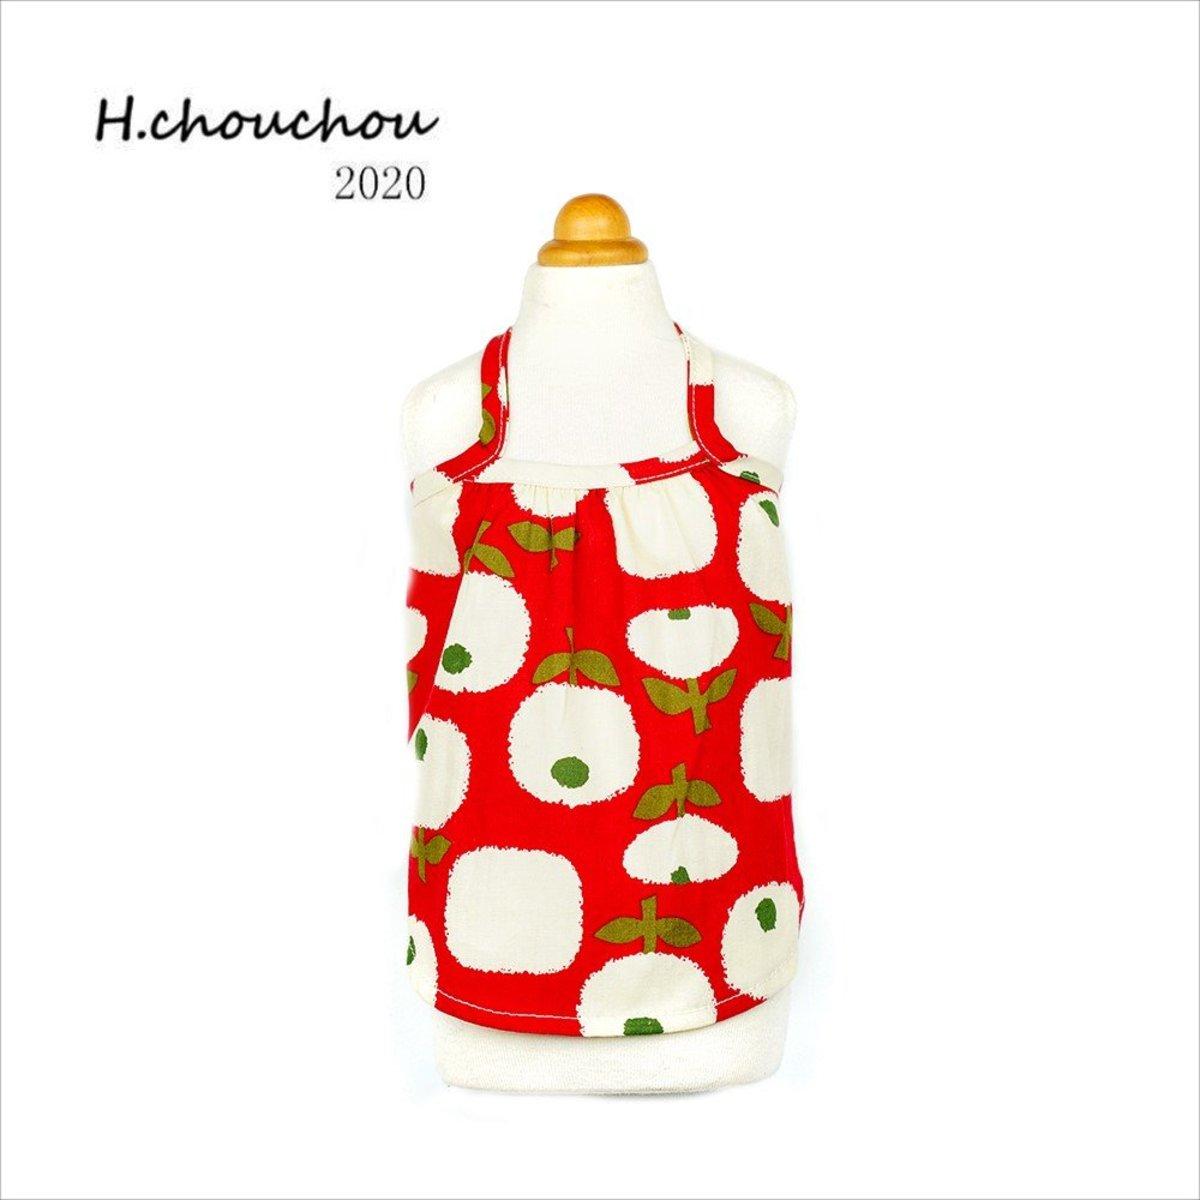 Red apple suspender skirt (Parallel Import Goods)(Size:10)